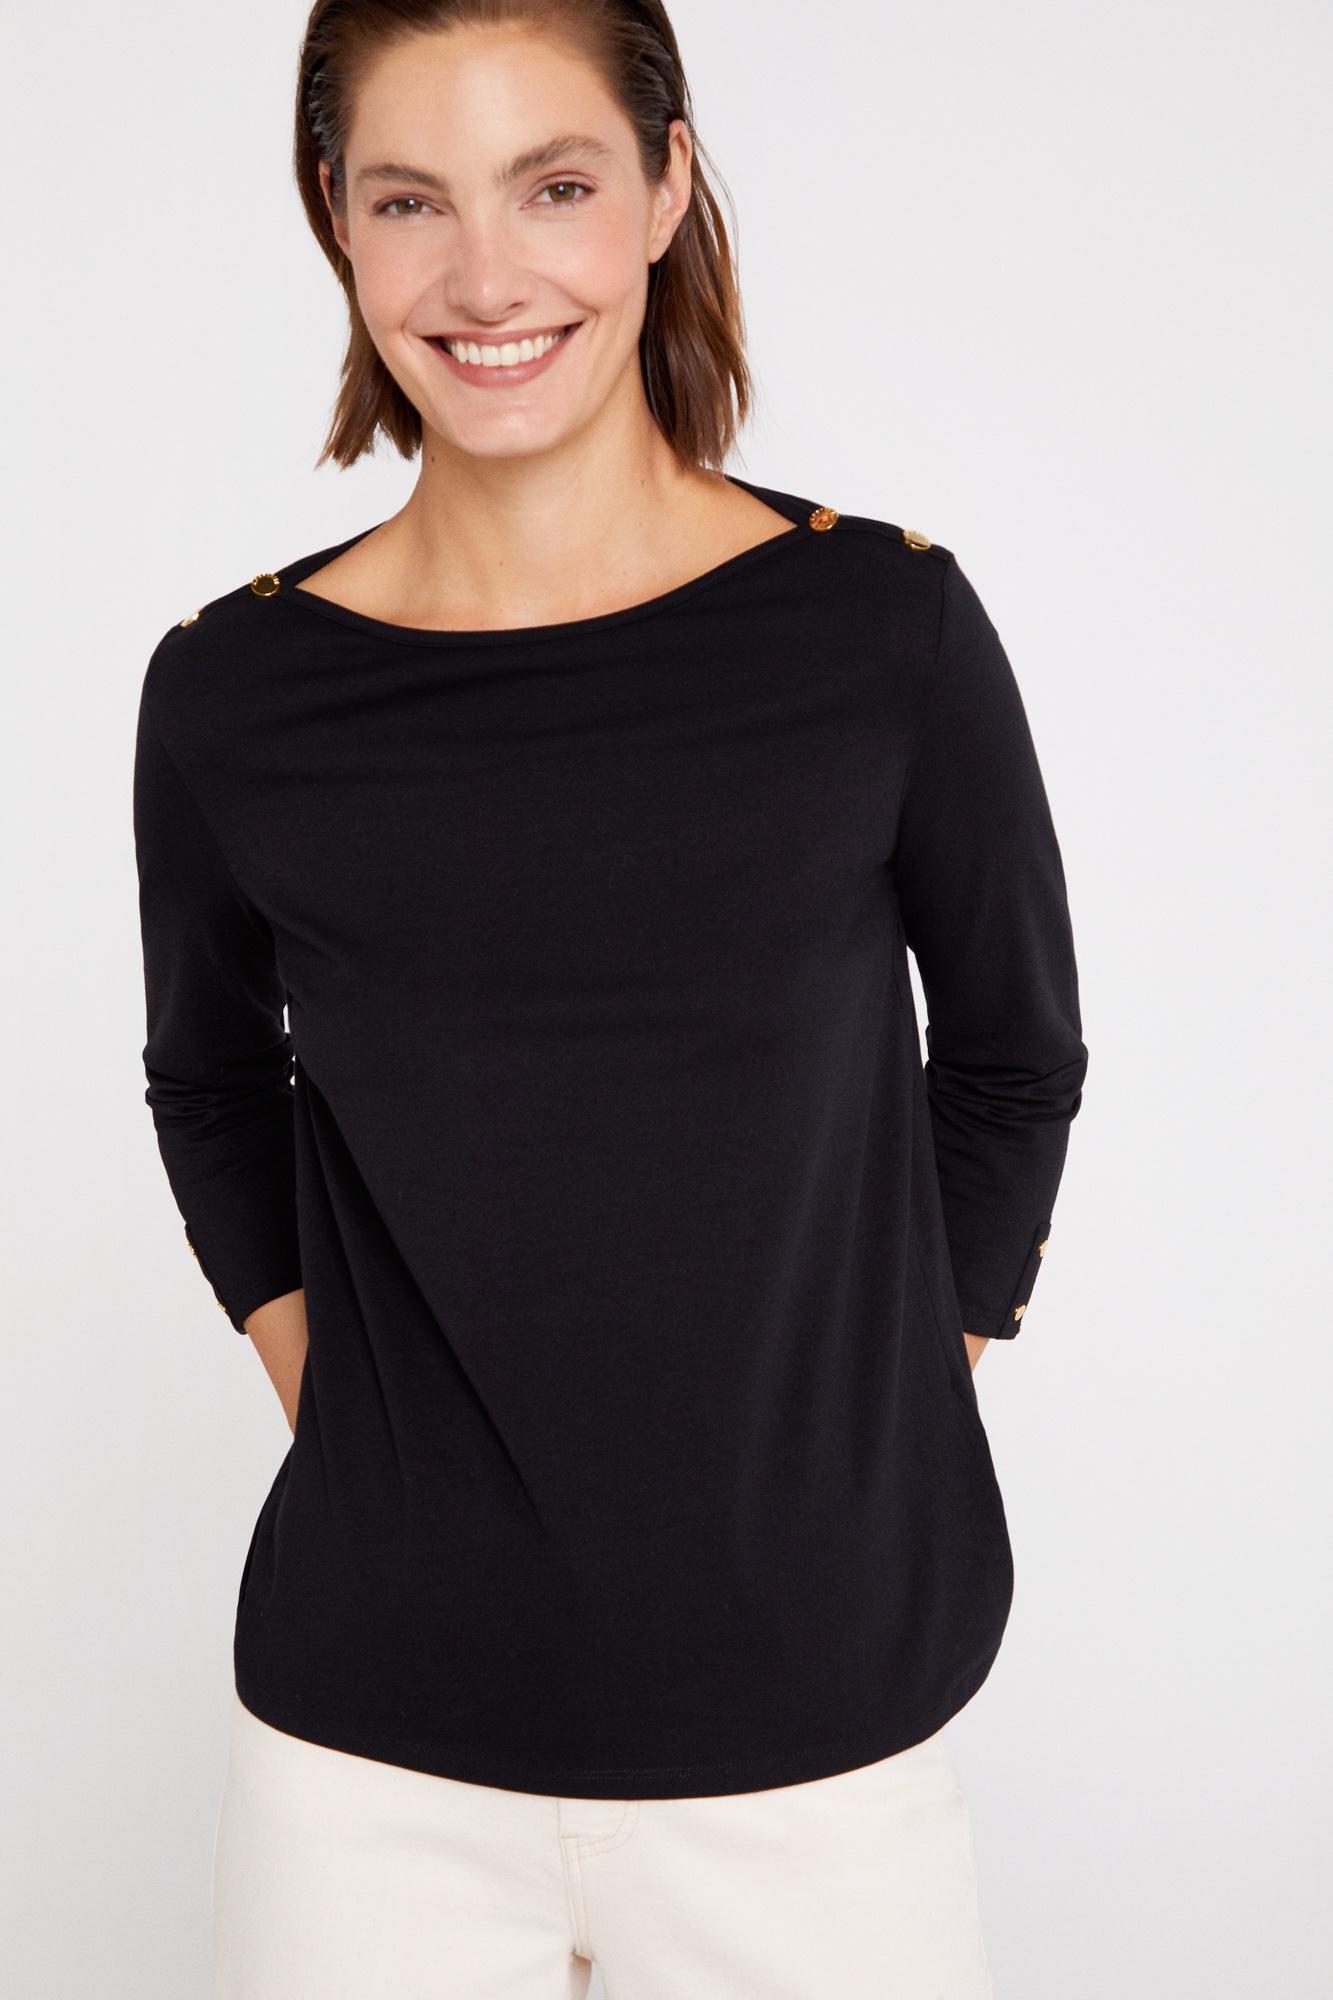 Camiseta escote barco algodón orgánico